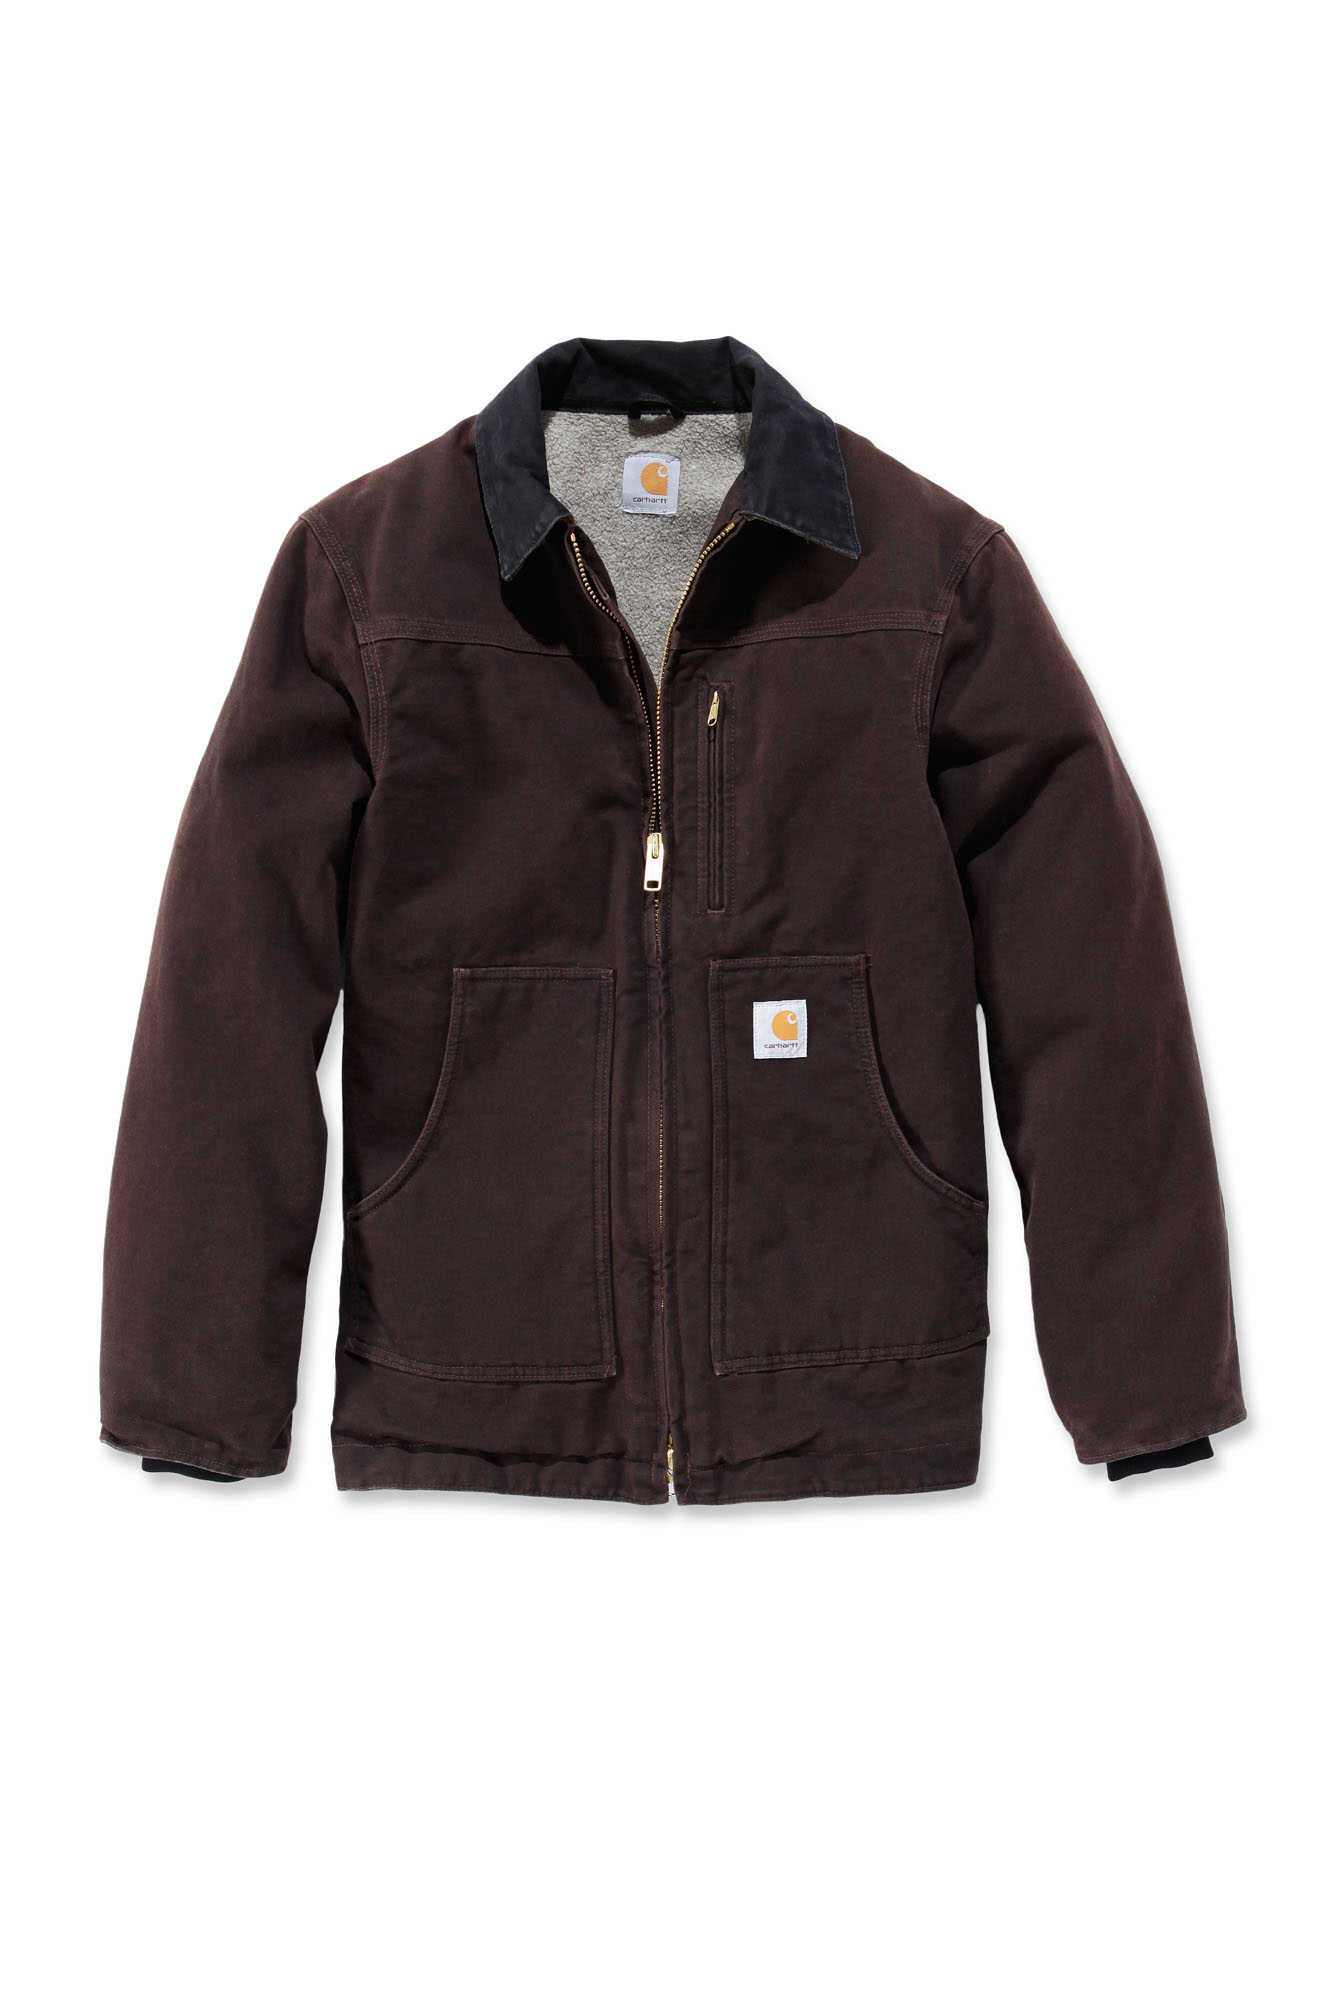 carhartt c61 sandstone ridge coat mens new workwear jacket ebay. Black Bedroom Furniture Sets. Home Design Ideas